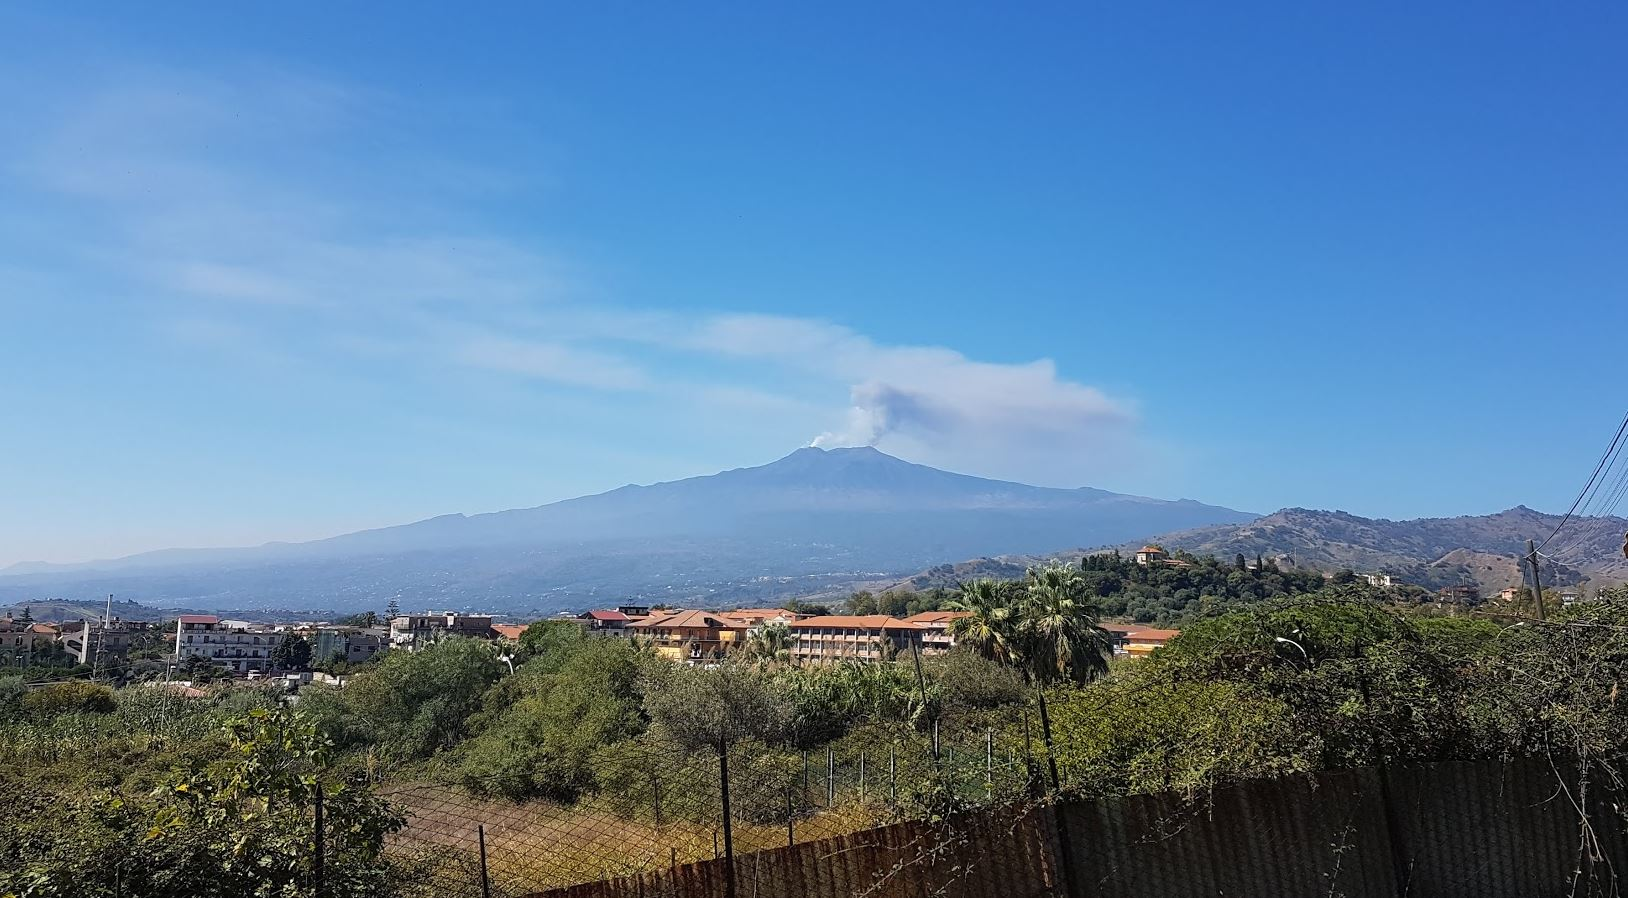 etna visible from surrounding of Taormina